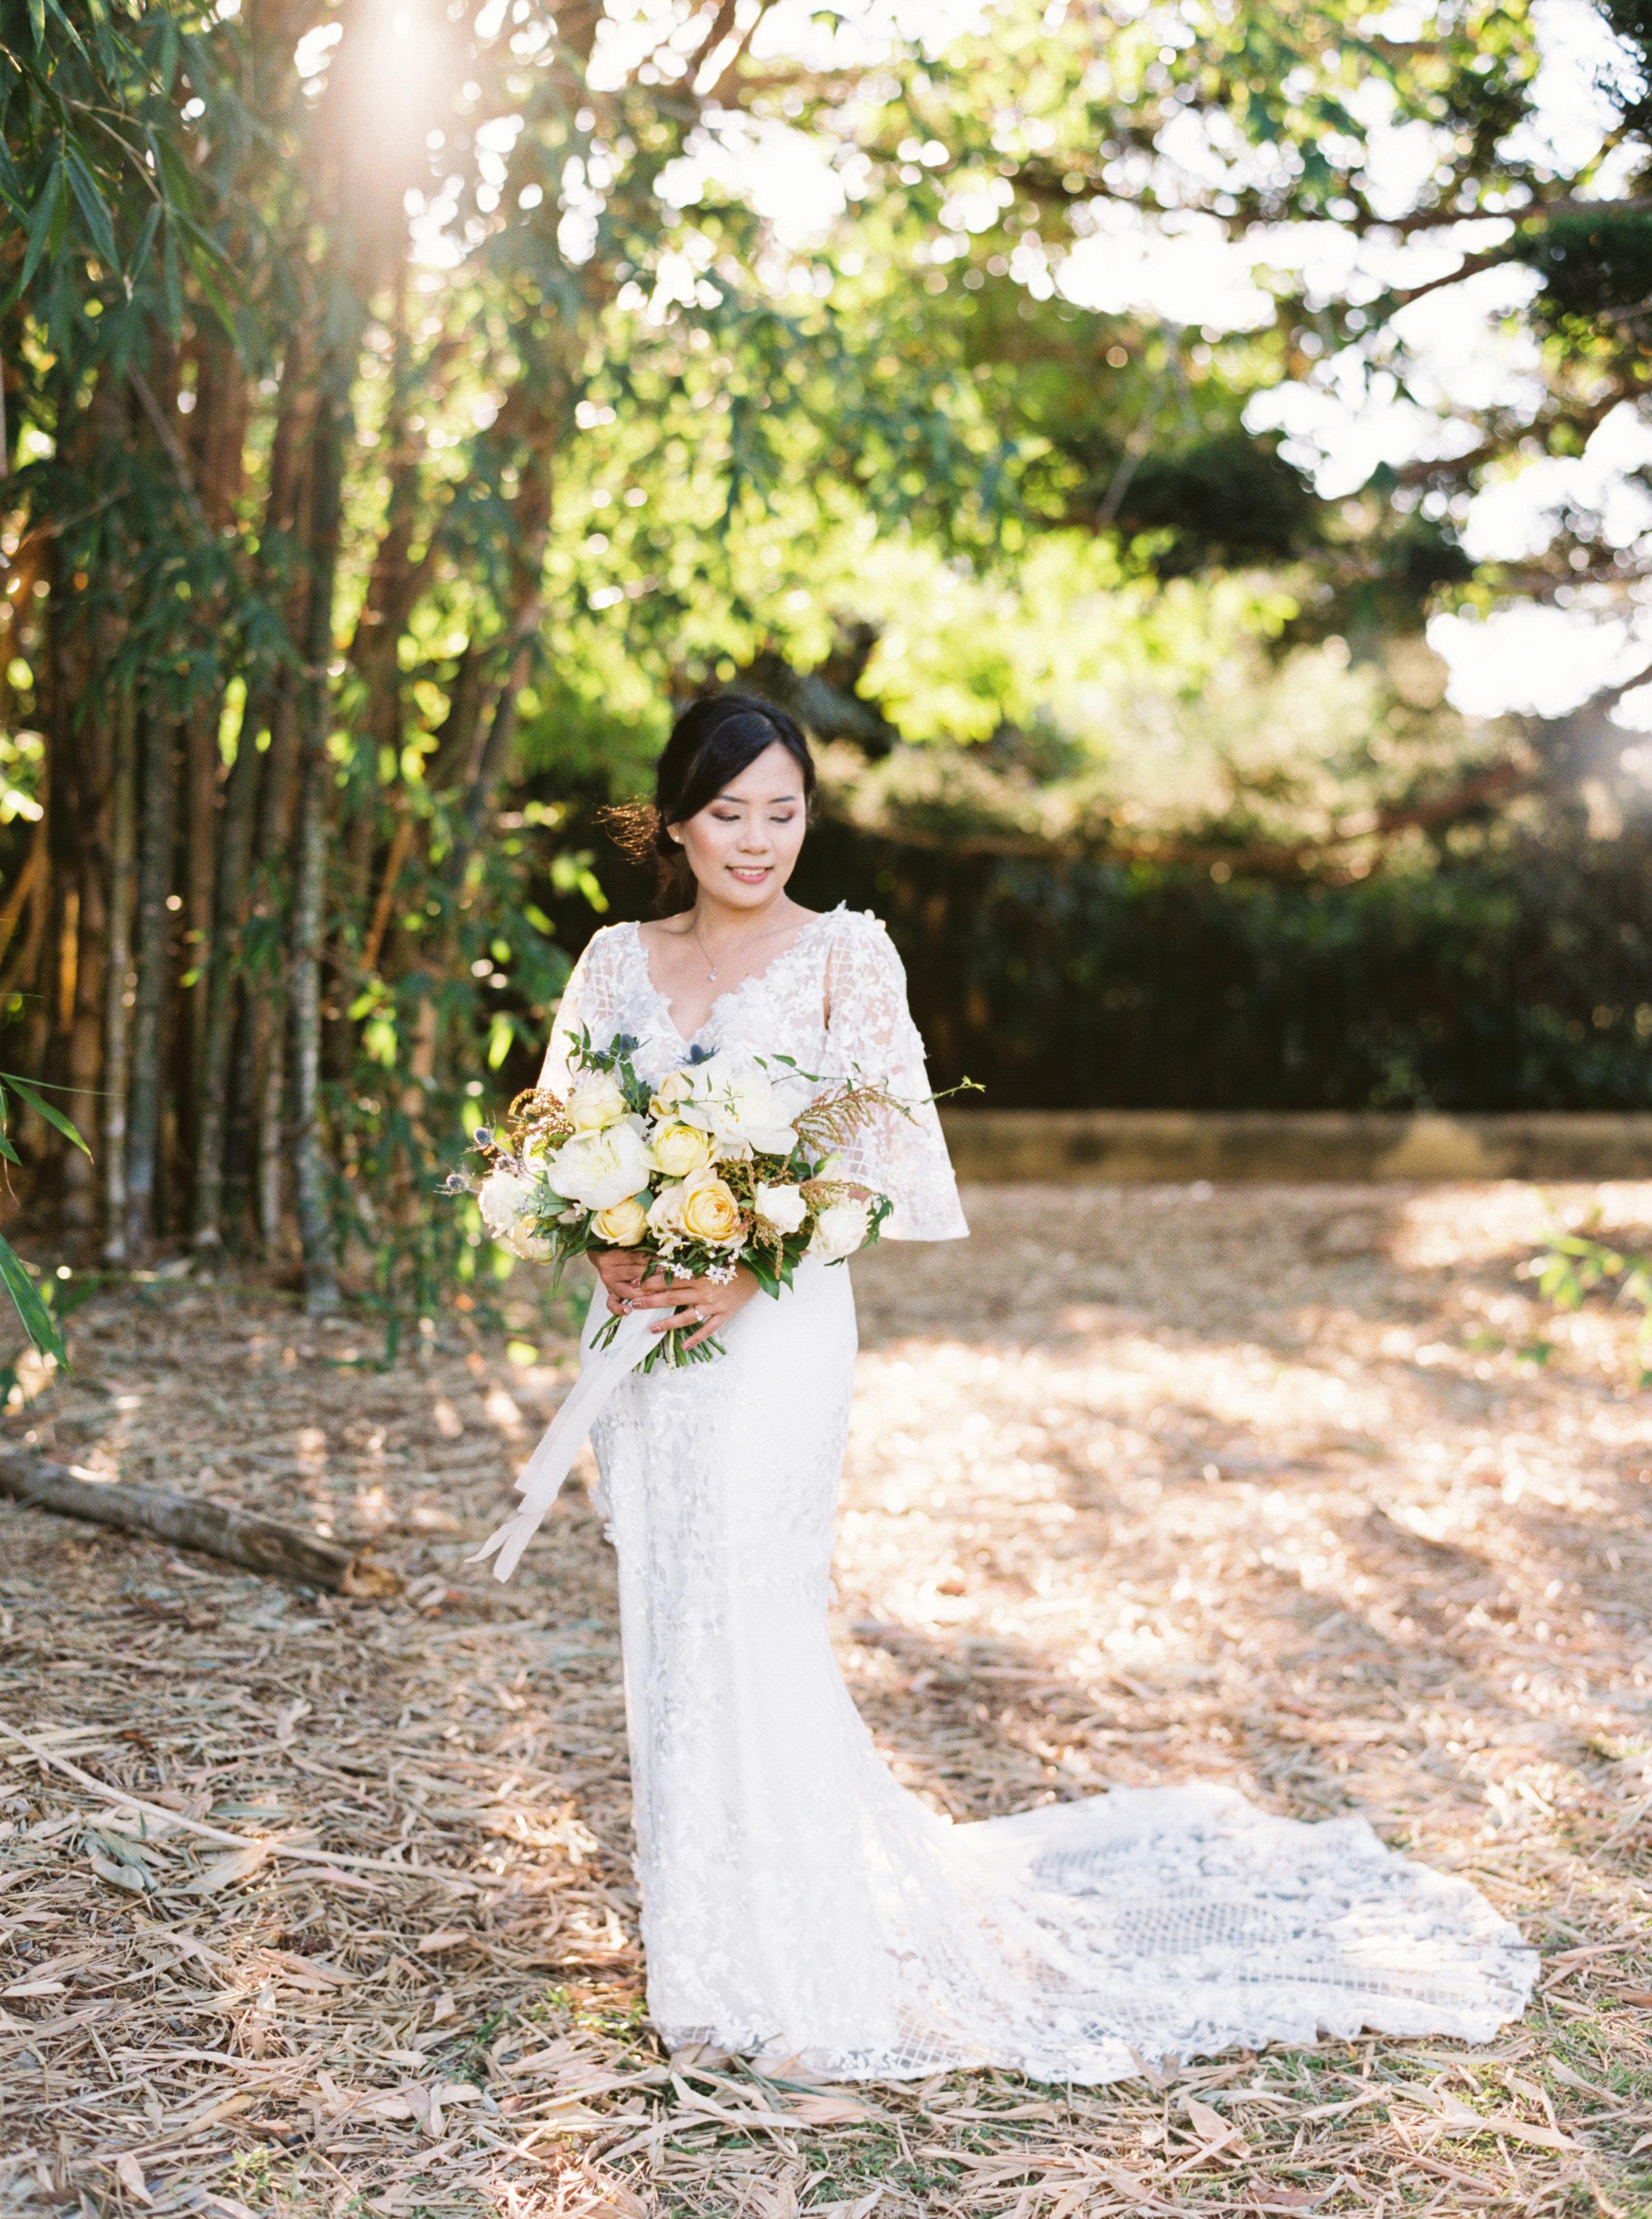 00016- Australia Sydney Wedding Photographer Sheri McMahon.jpg